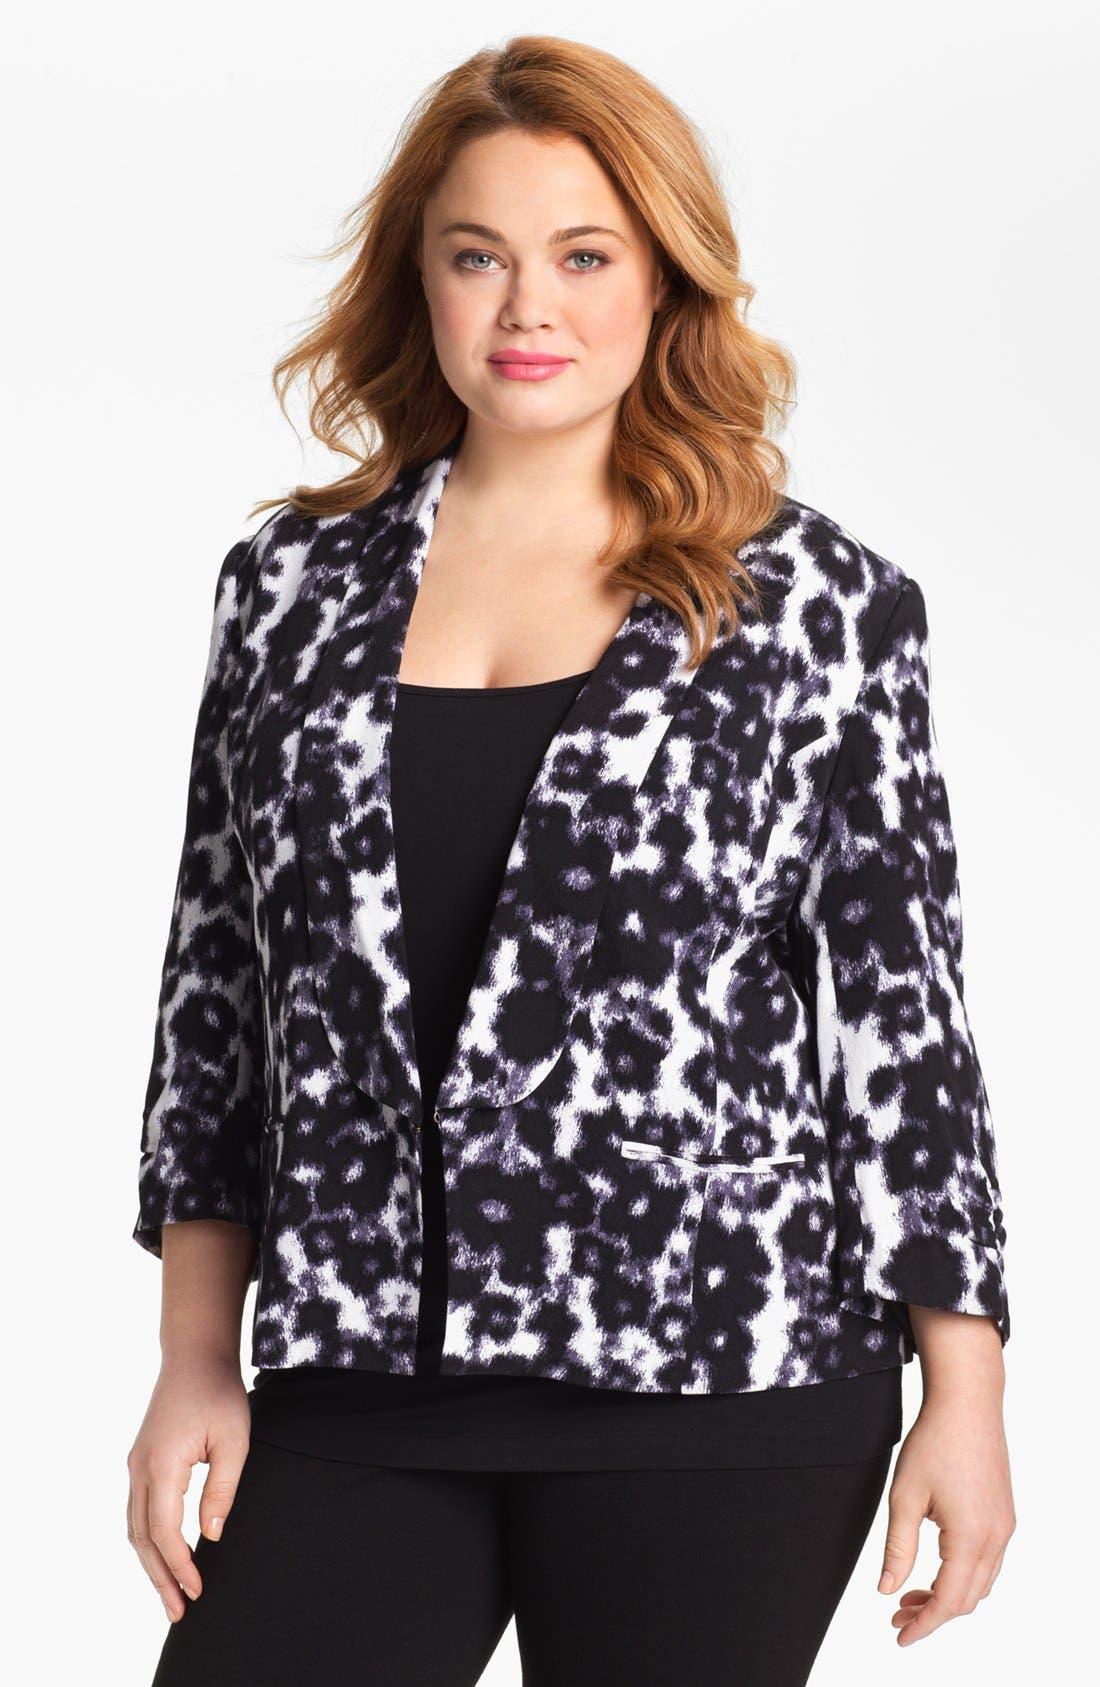 Alternate Image 1 Selected - Sejour Print Tuxedo Jacket (Plus Size)